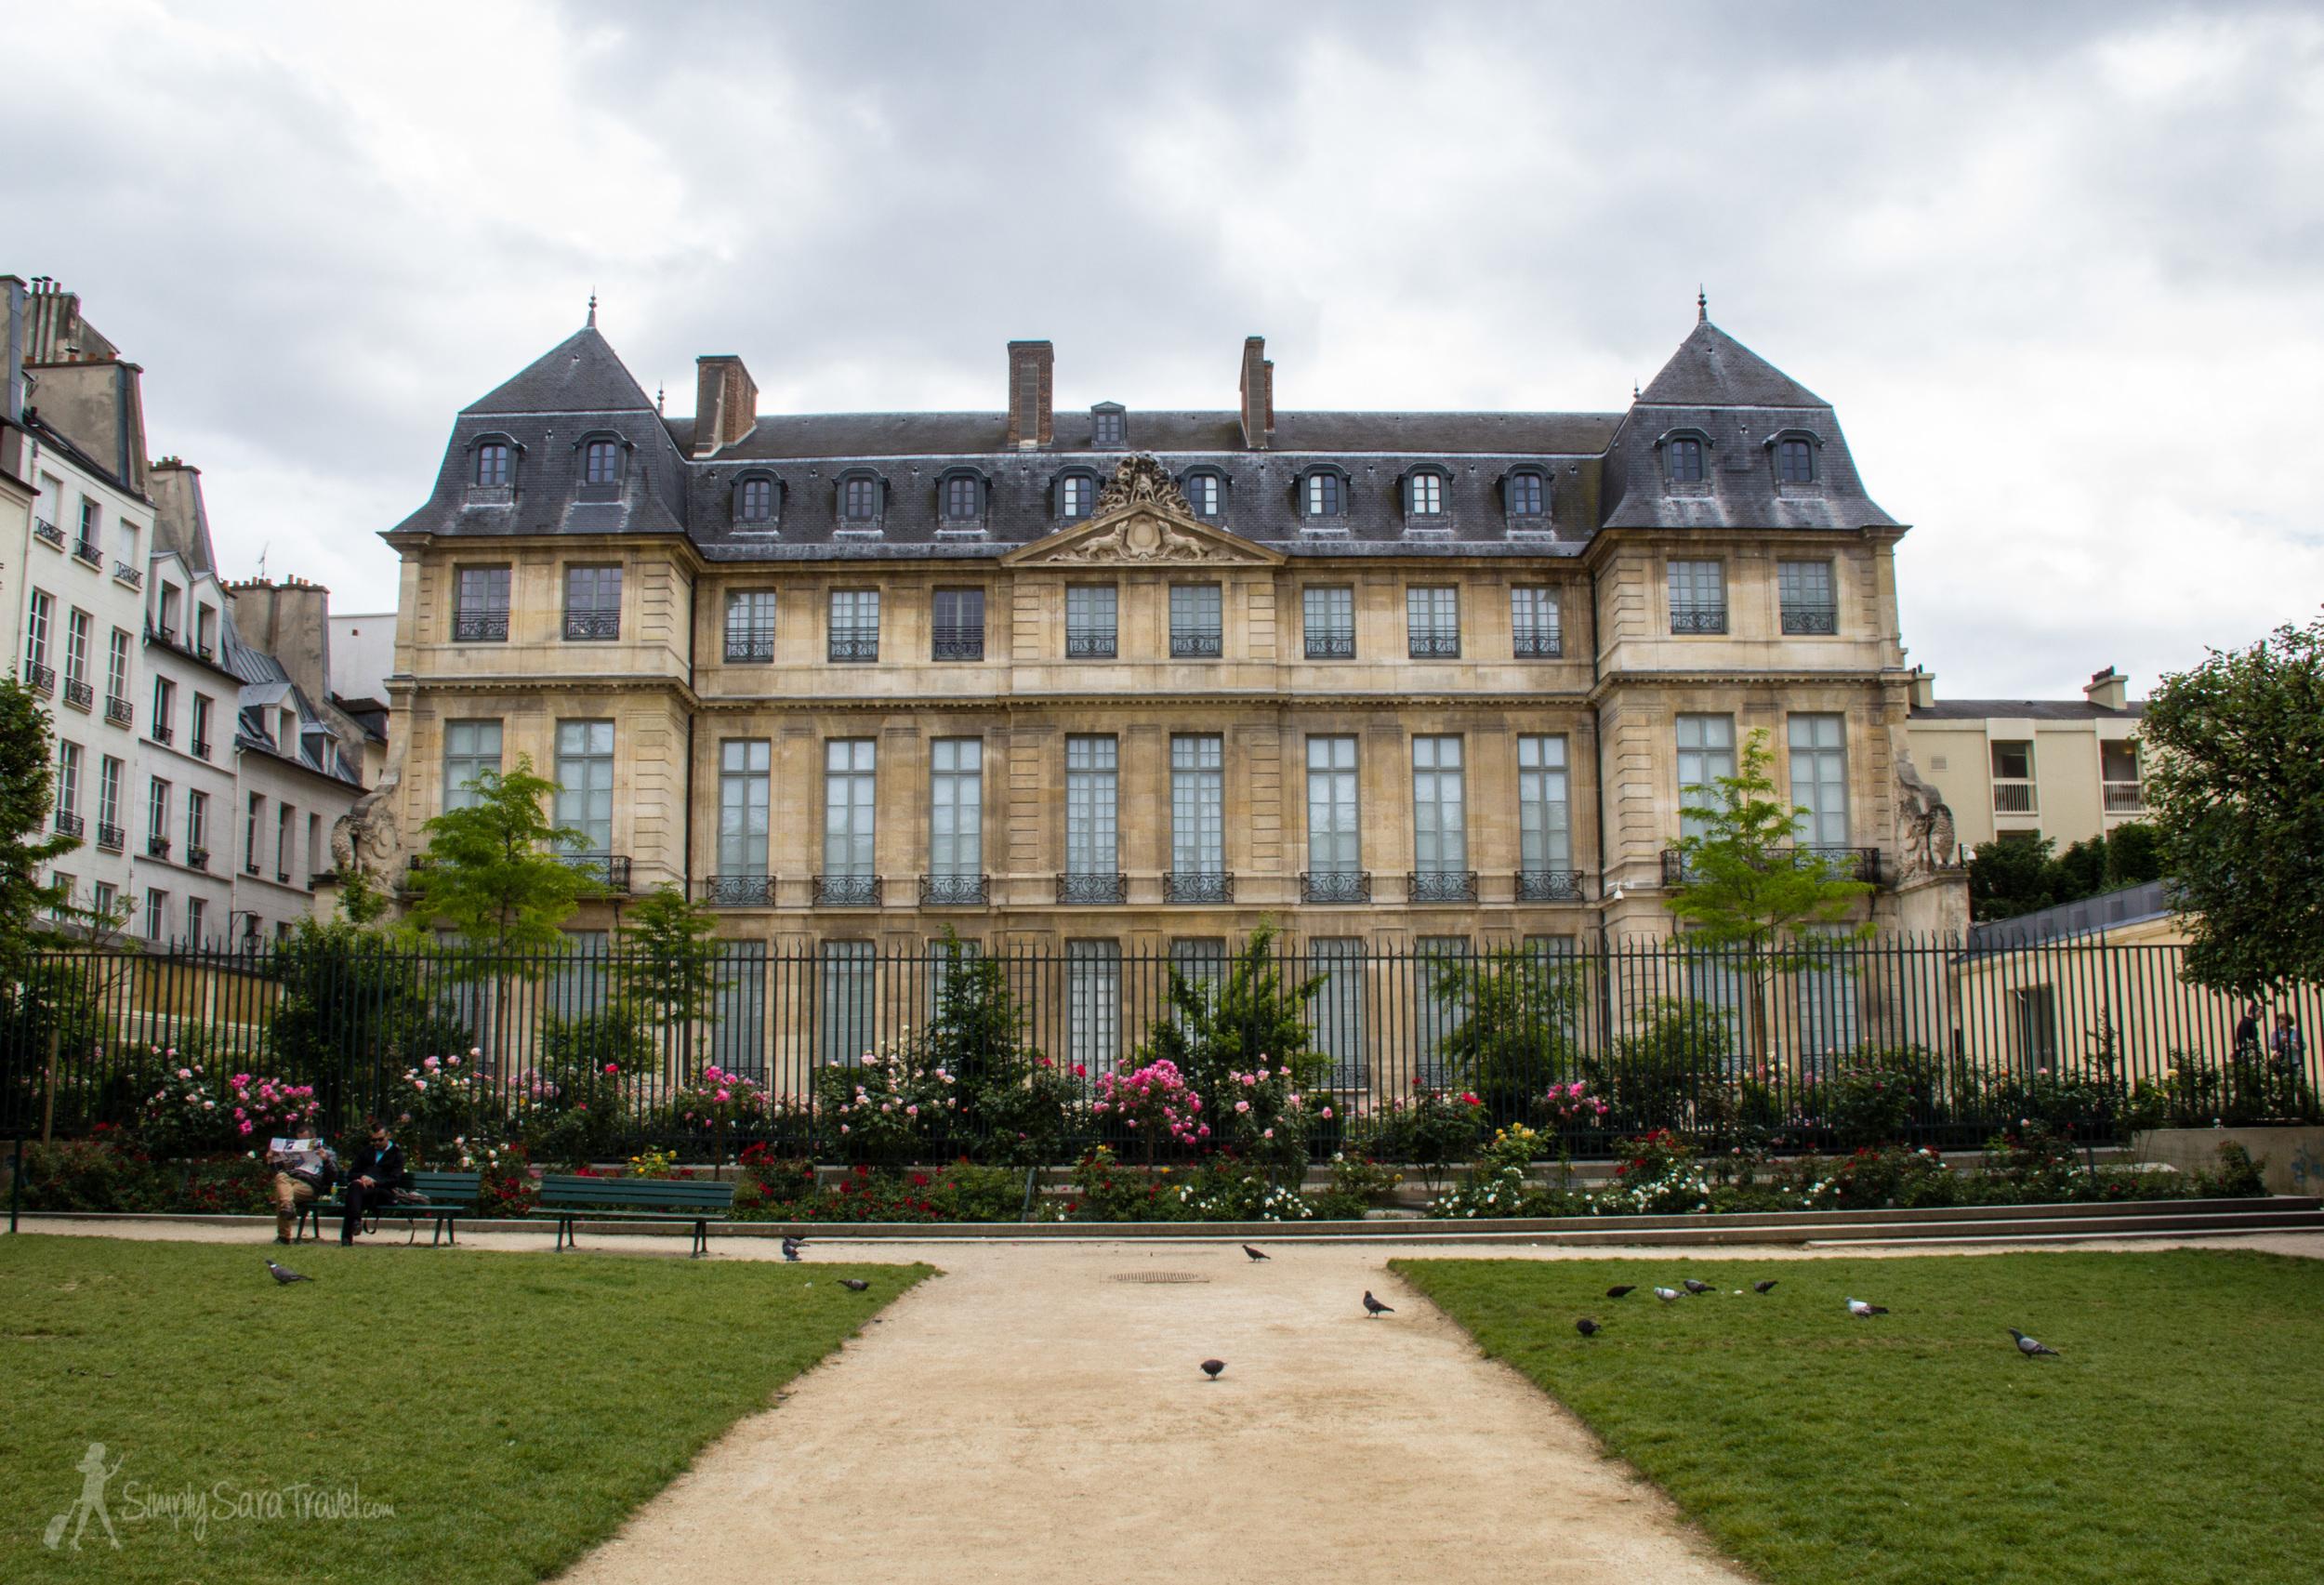 The back of theHôtel Salé in the Marais